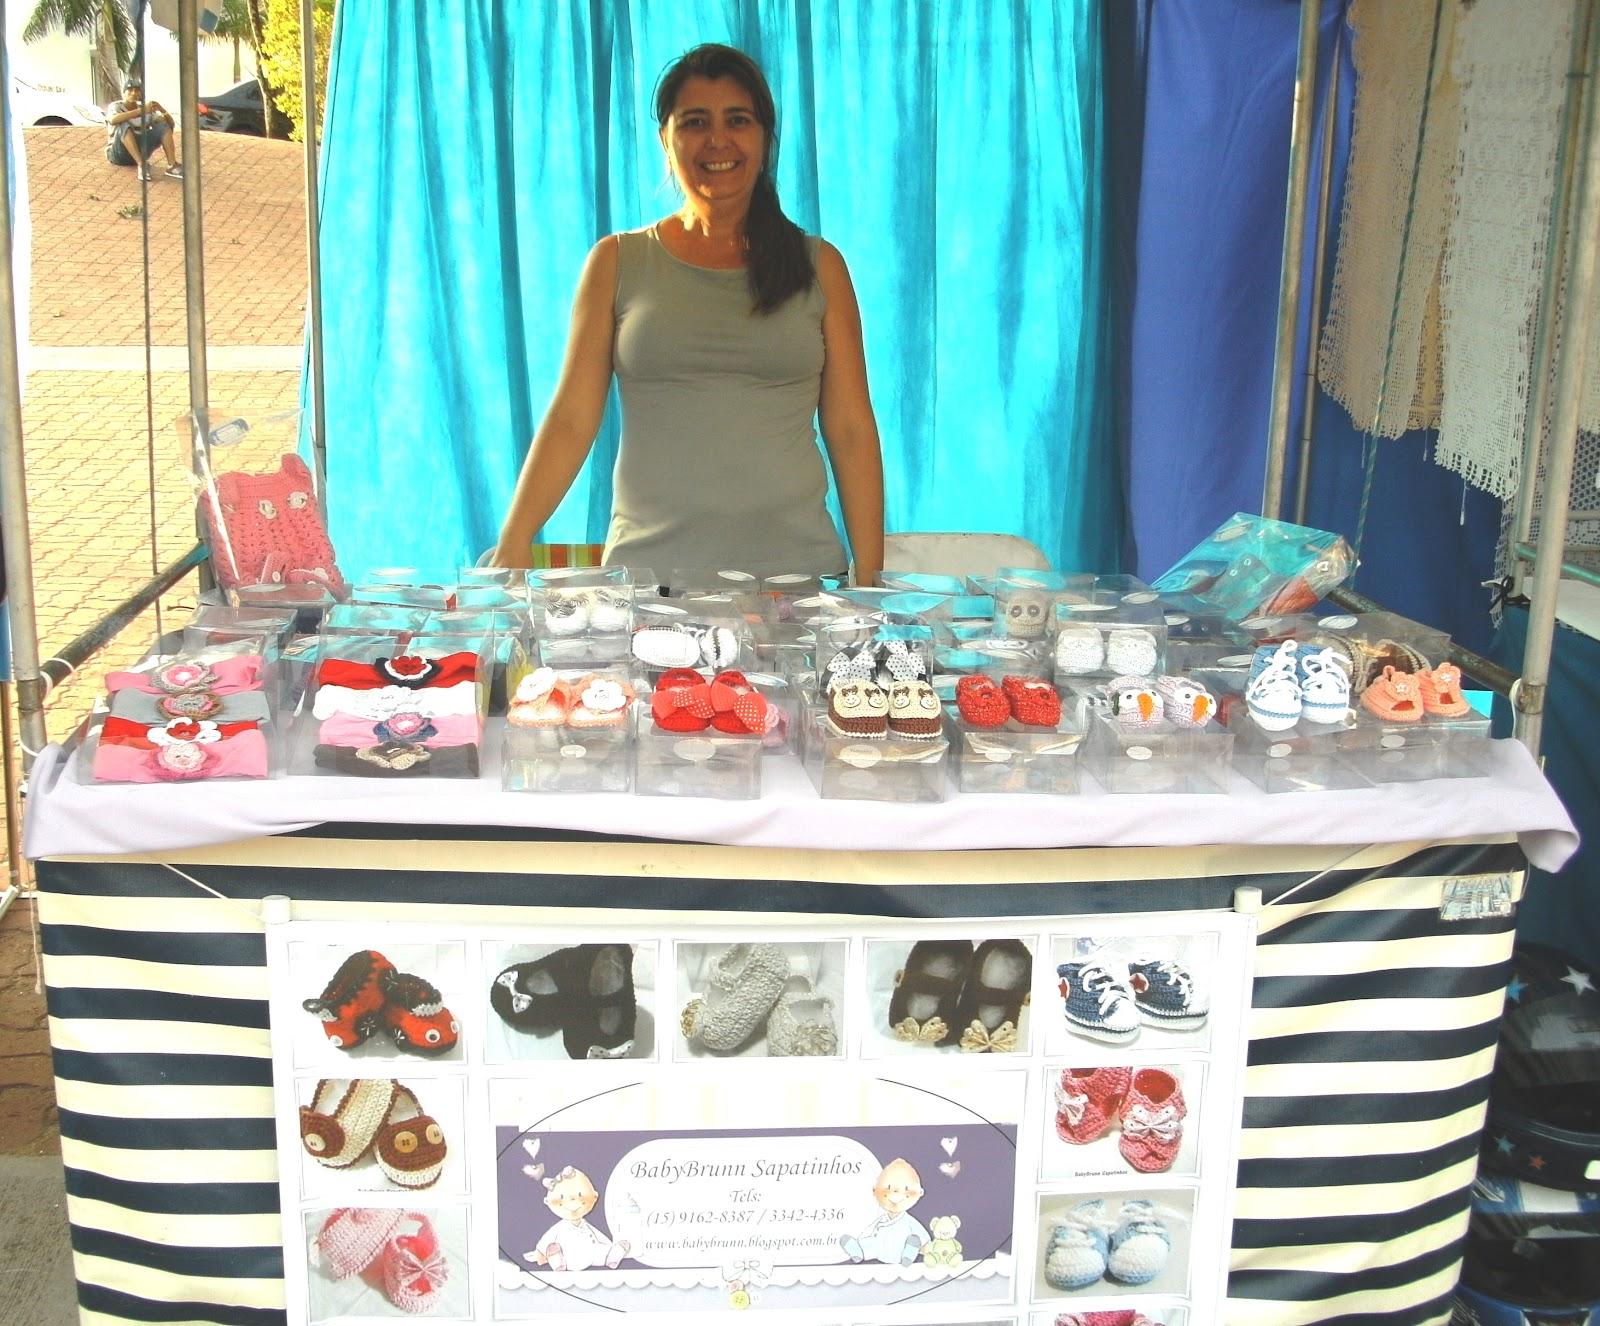 Armario Ropero Sinonimos ~ feira de artesanato em Sorocaba ARTIGOS DE ENXOVAL PARA BEB u00caS